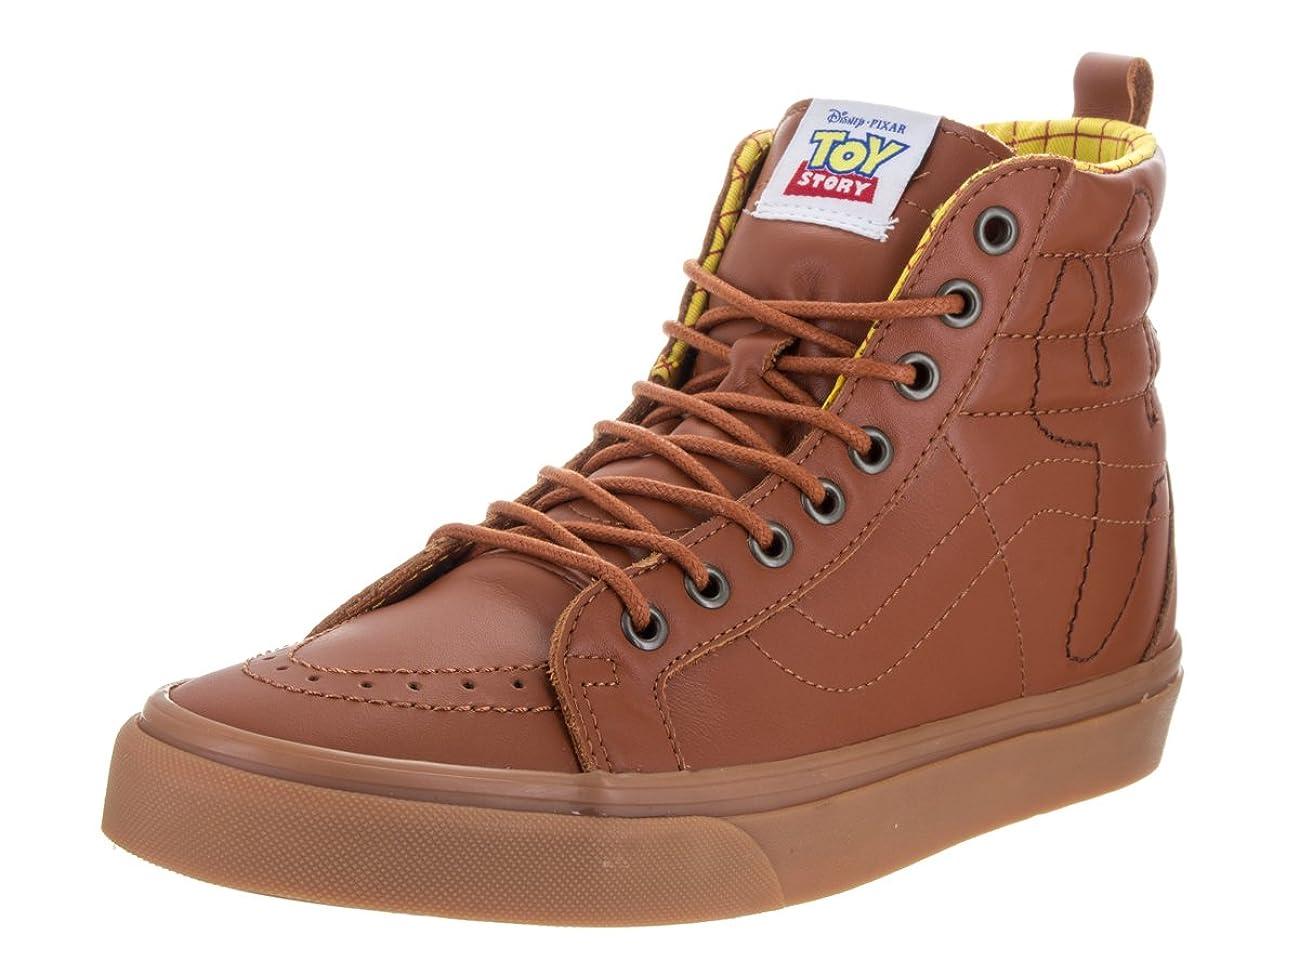 VANS SK8-Hi Reissue PT Disney-Pixar Toy Story Leather Woody Sneaker VN0A2XS3M4Z Unisex Shoes